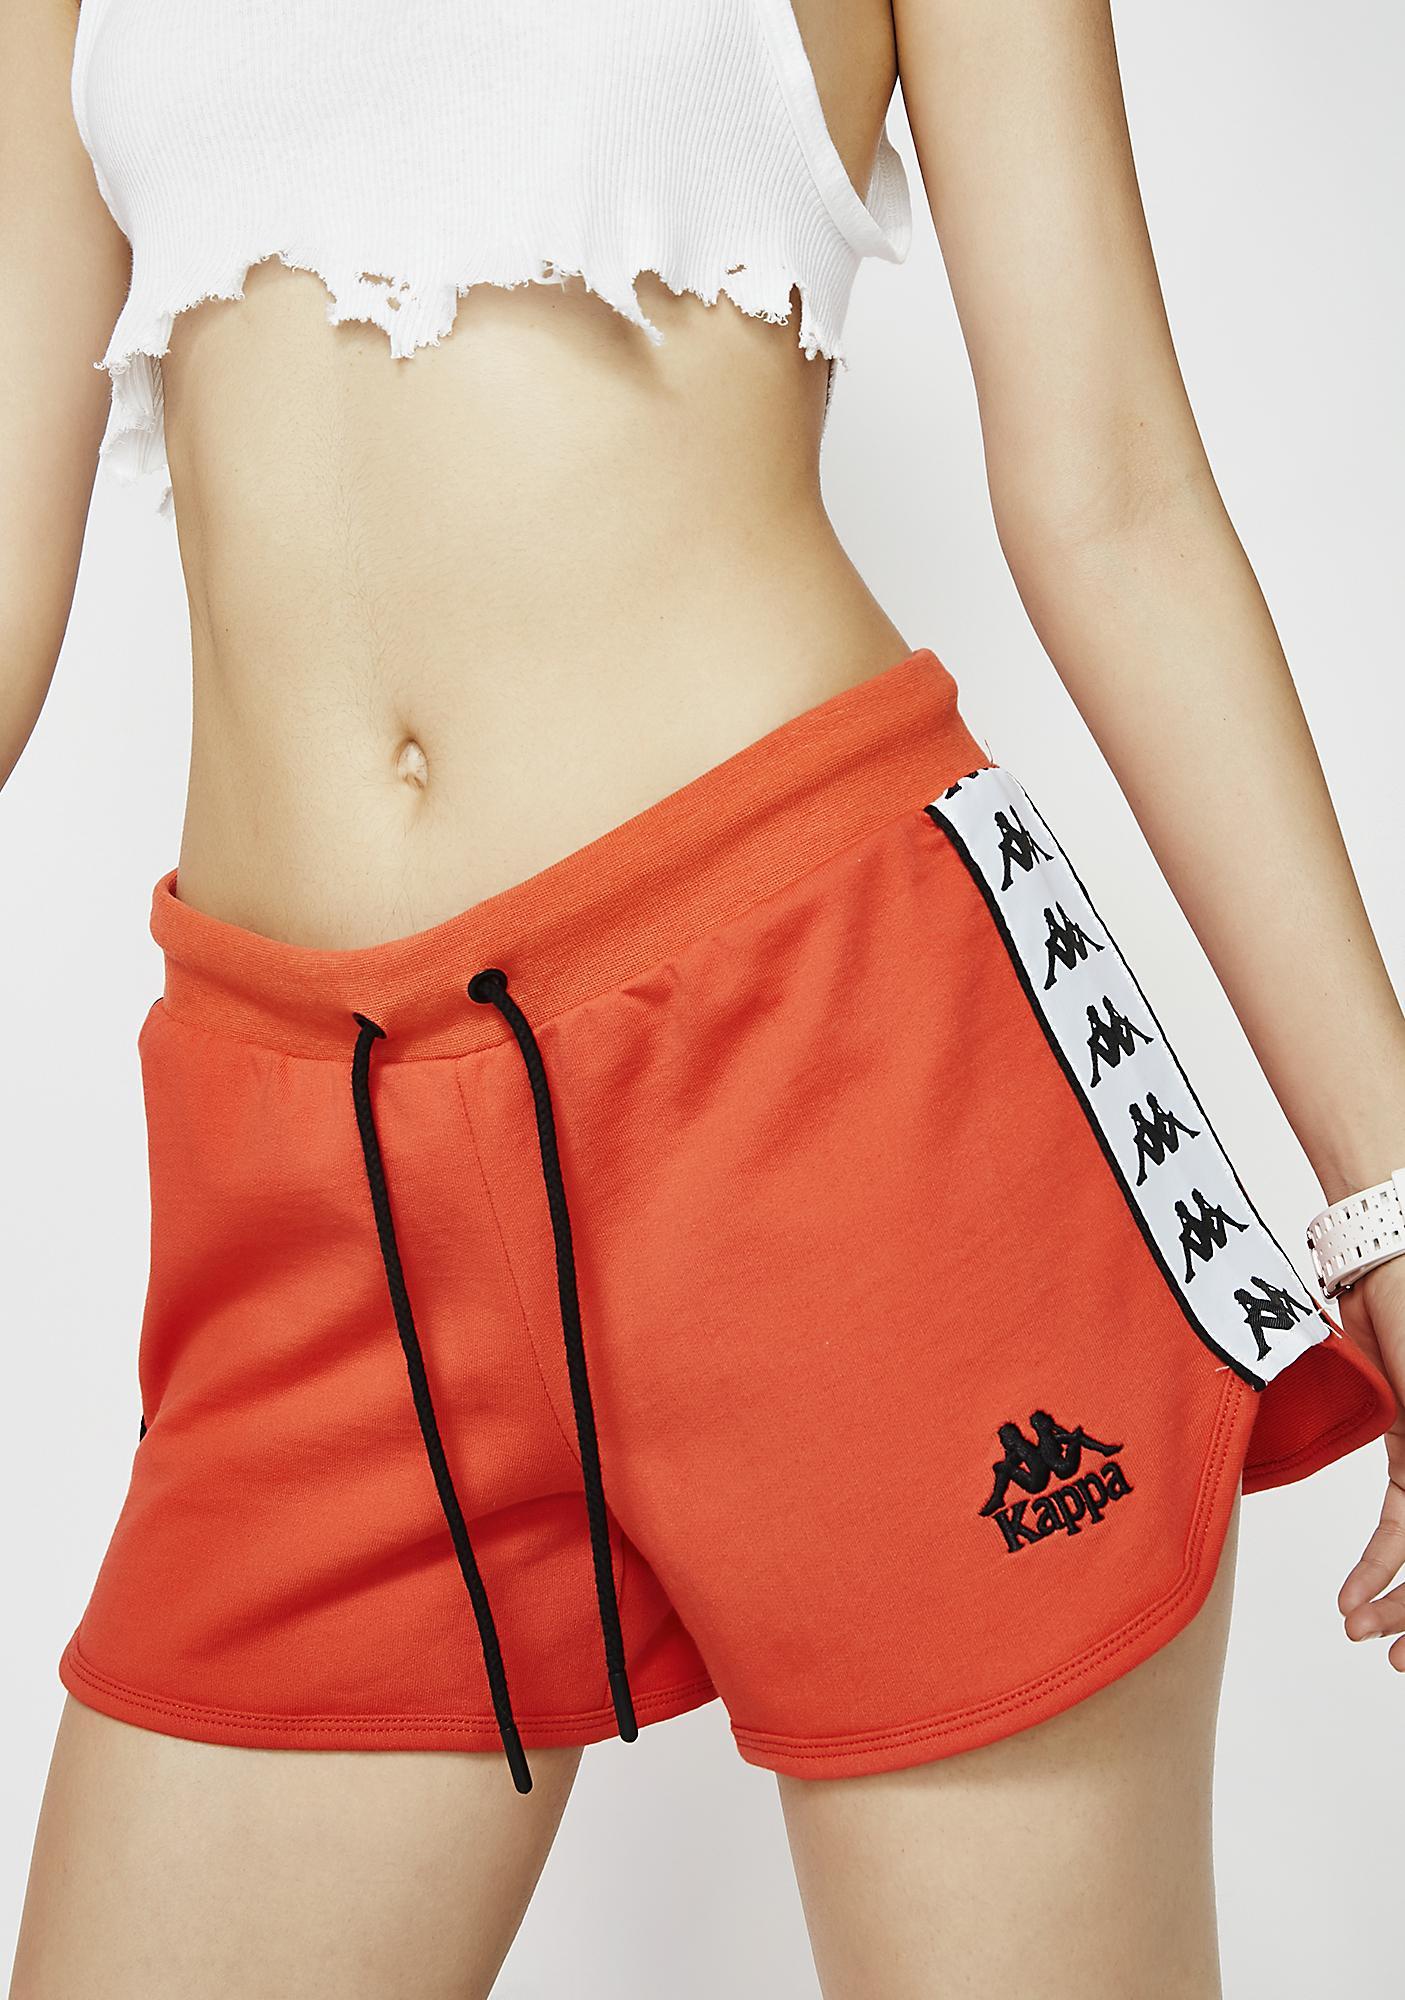 Kappa Authentic Custard Shorts